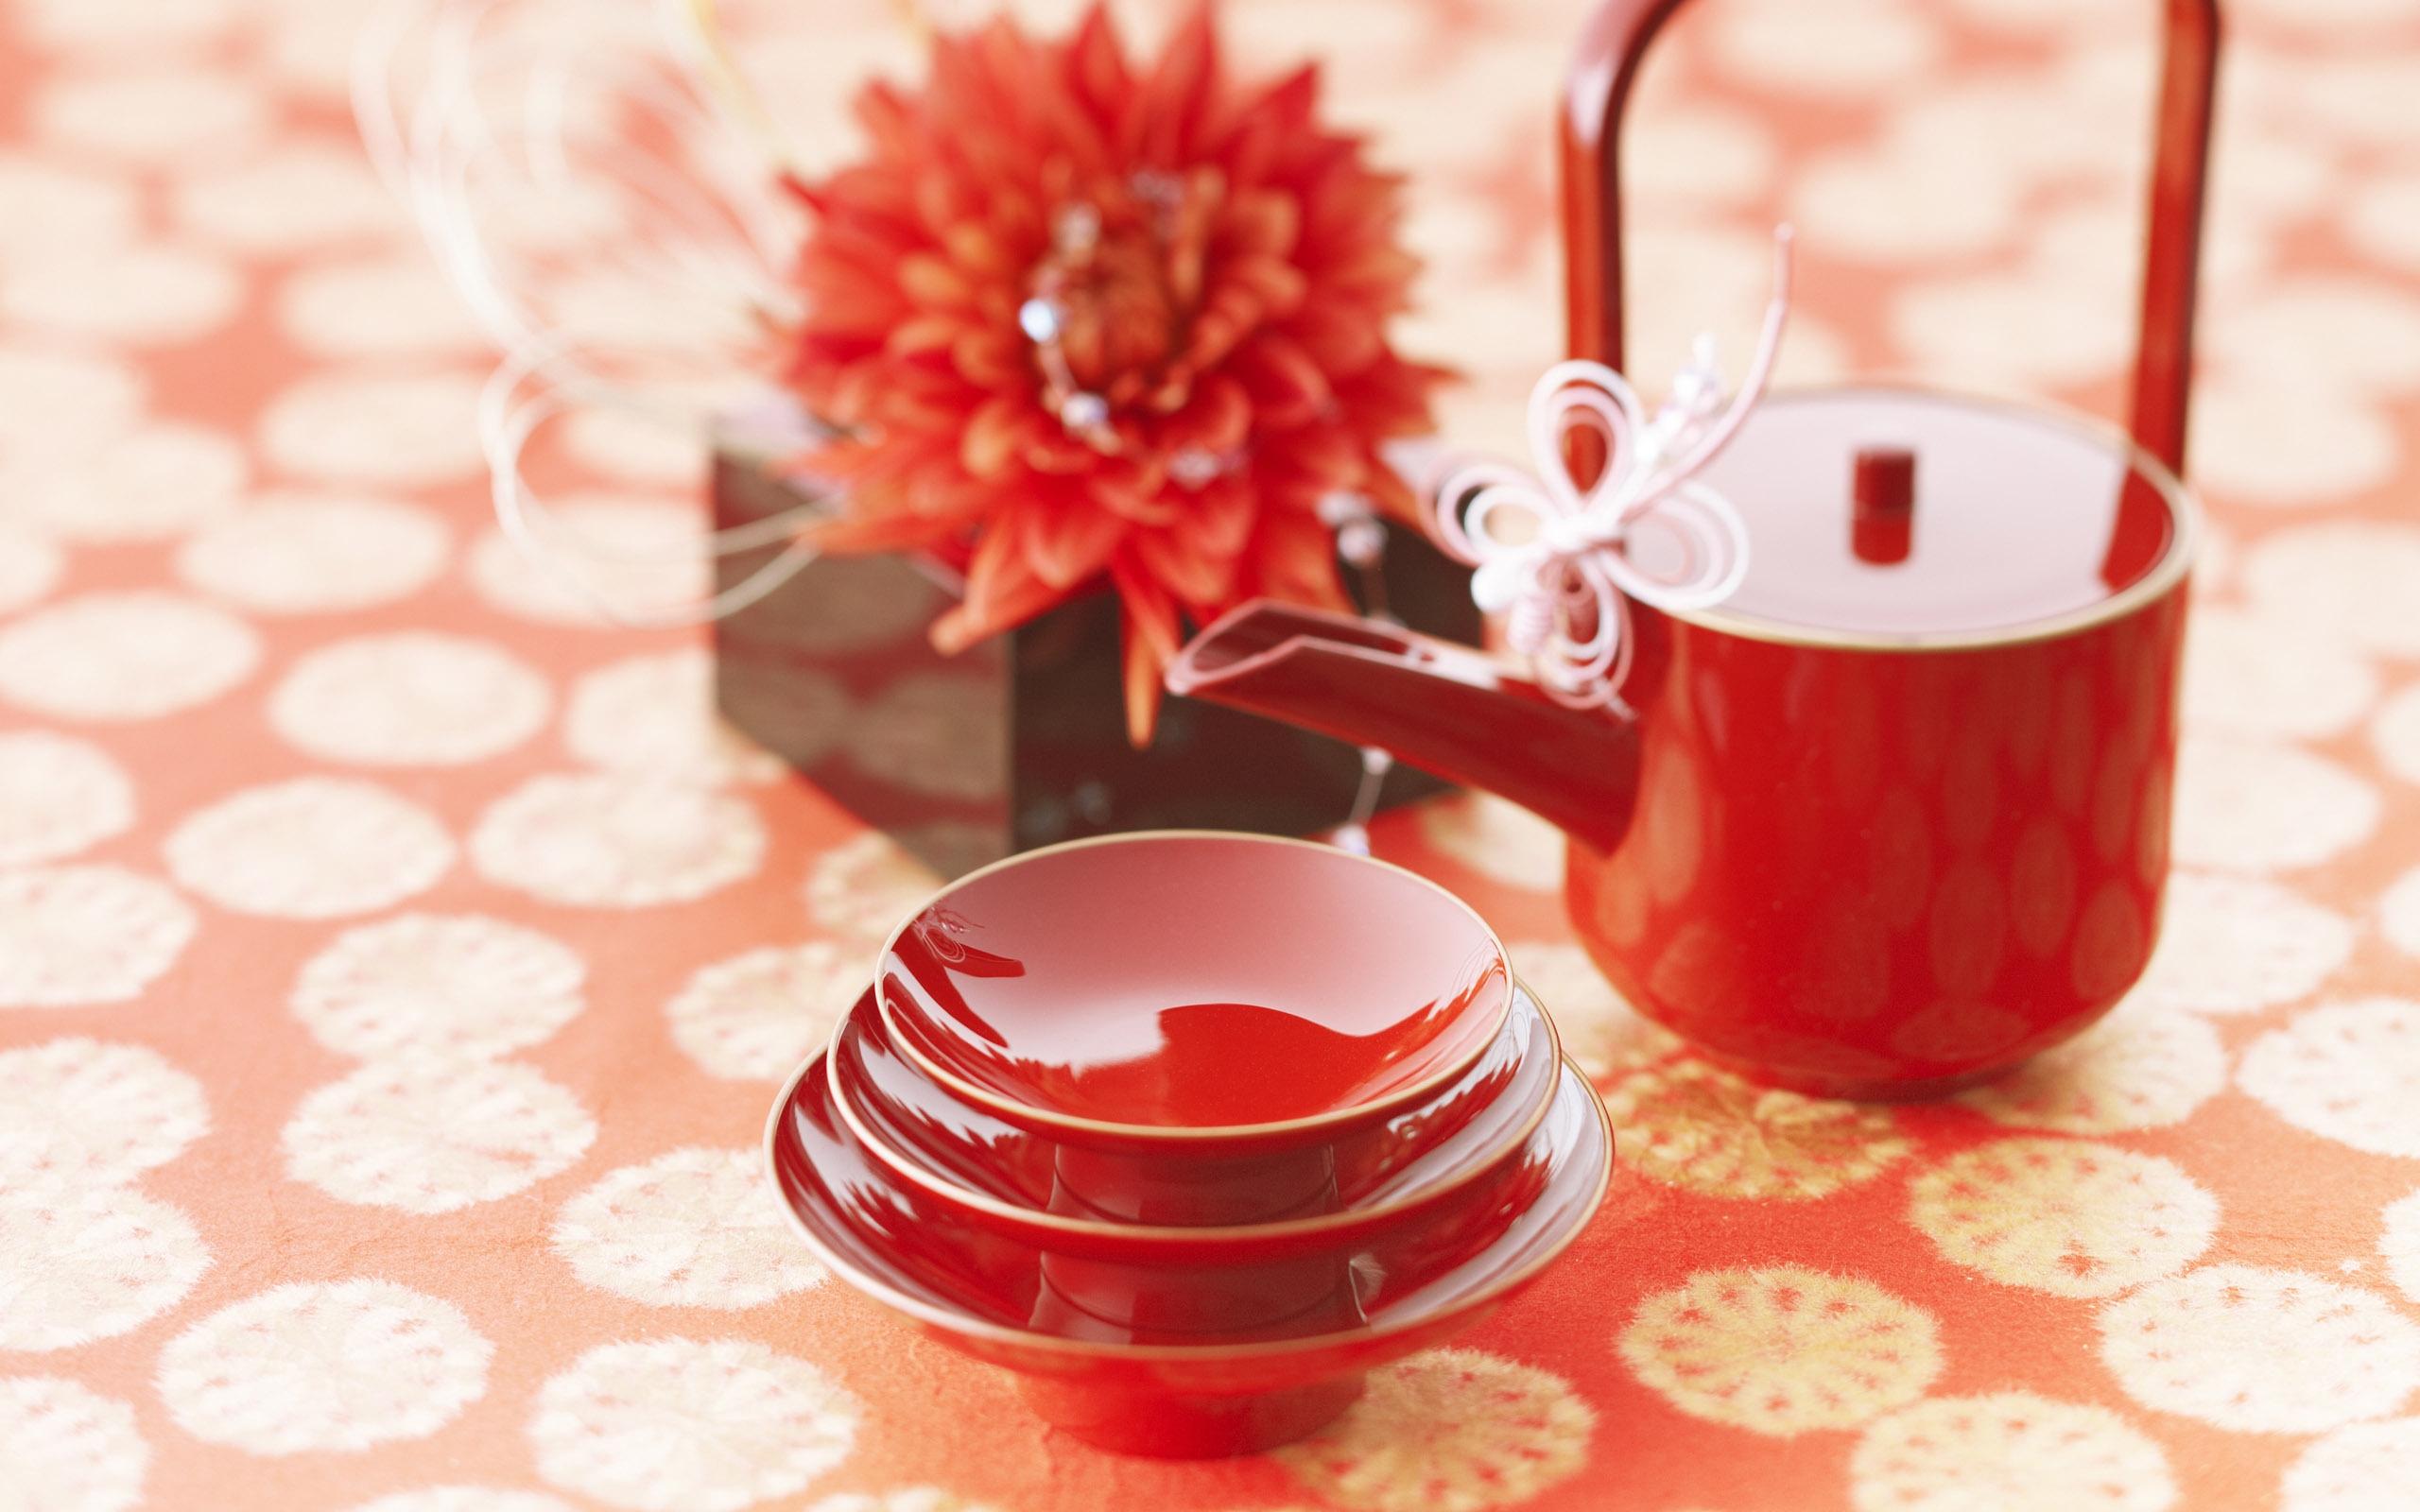 Japan Lebensmittel Blumen China Rot Kaffee Tee Valentinstag Rosa Blume  Kerze Stimmung Beleuchtung Blütenblatt Tassen Produzieren